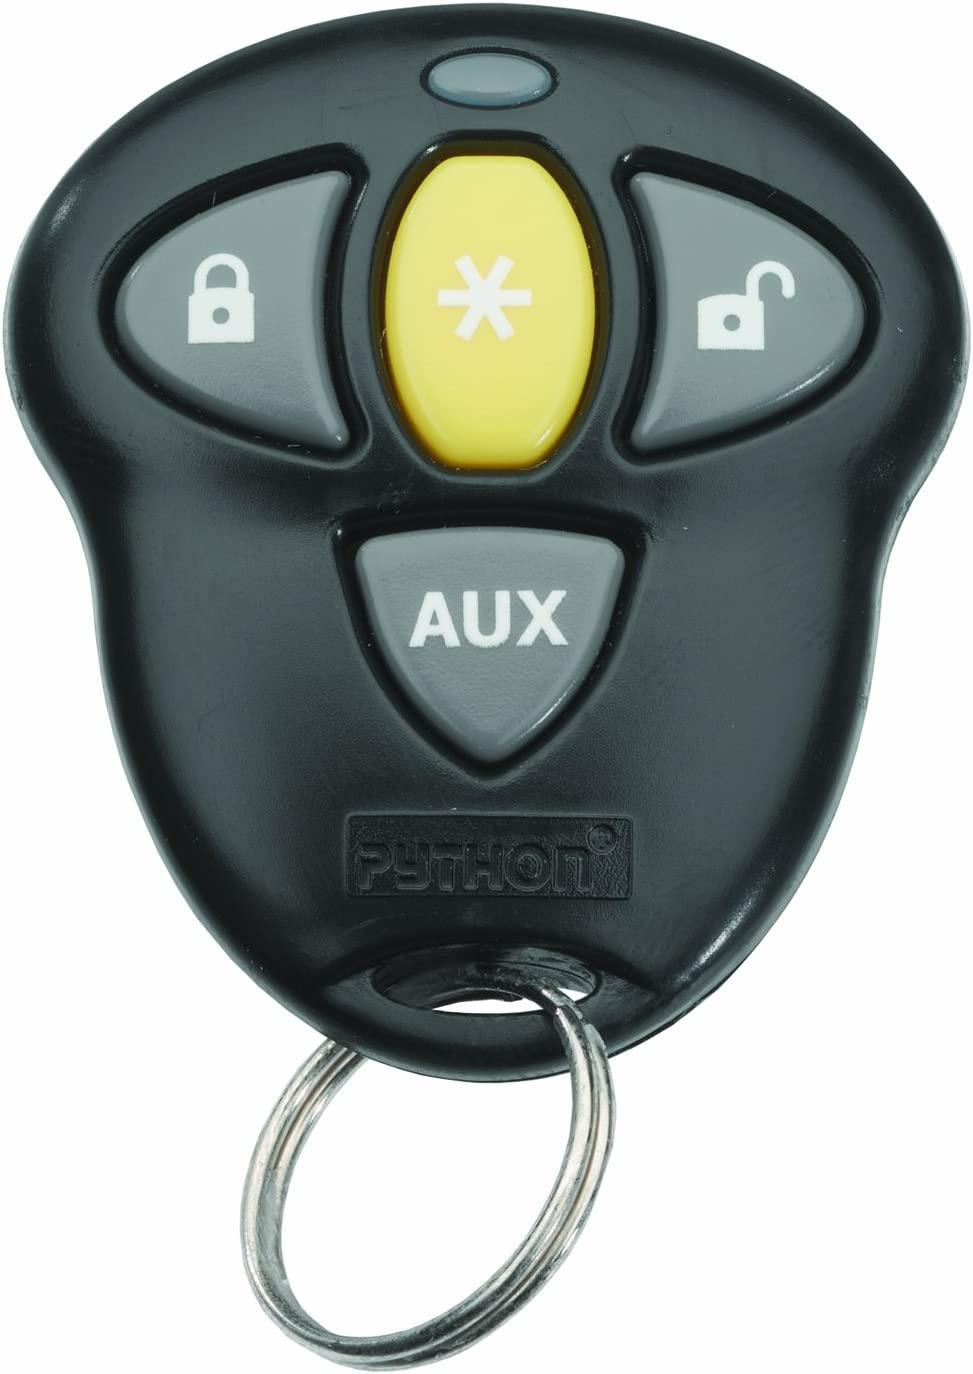 PYTHON EZSDEI474P 474P Factory OEM KEY FOB Keyless Entry Remote Alarm Replace AFTERMARKET